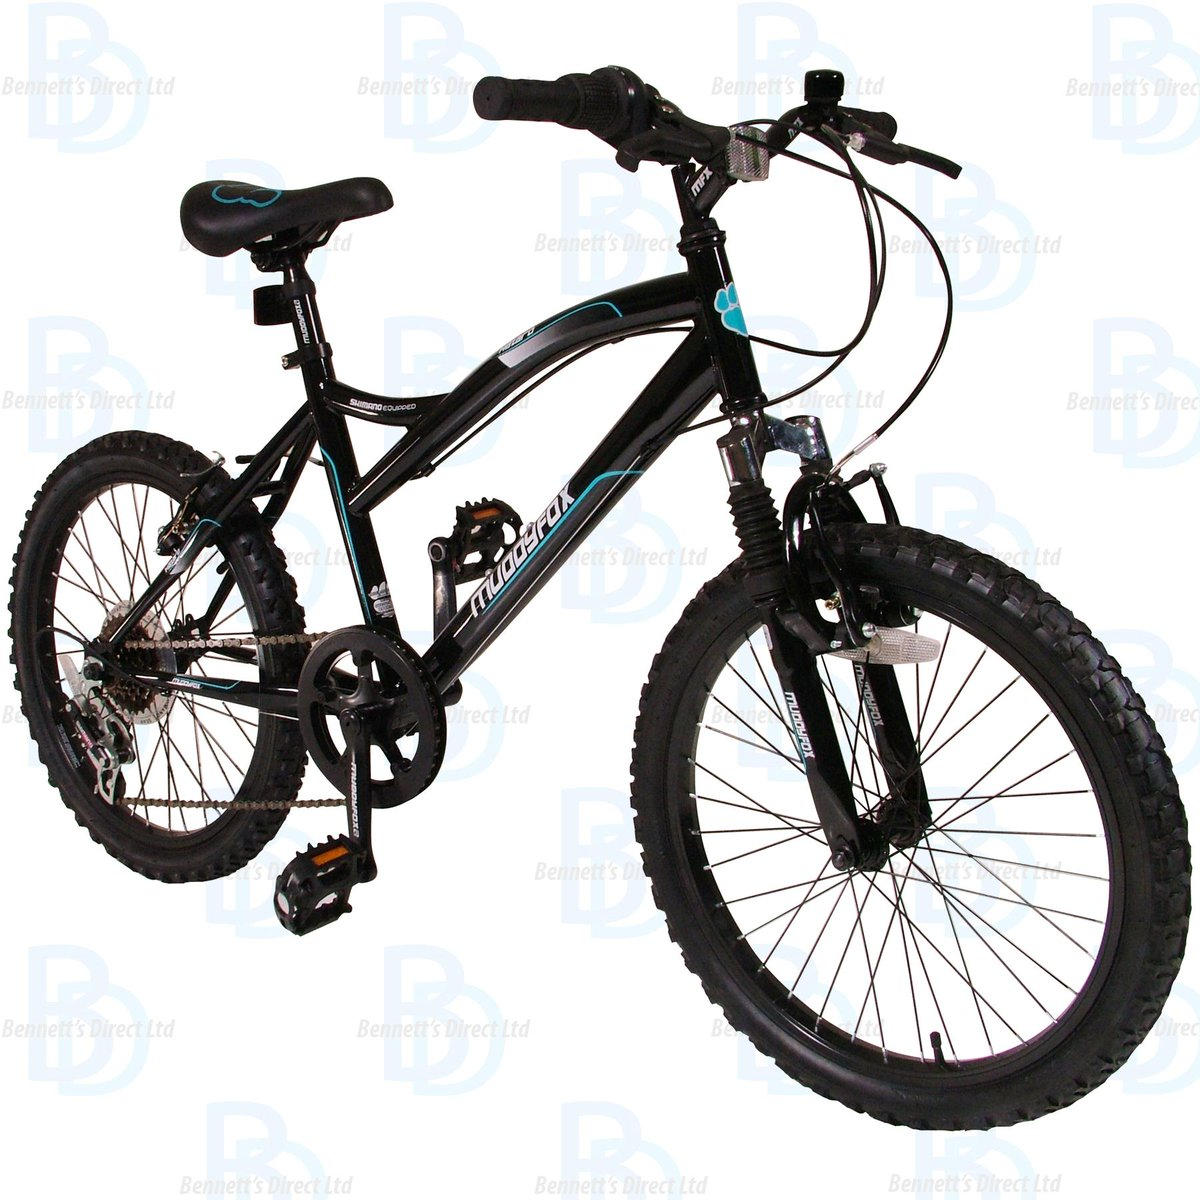 LIOOBO Kids Bike Bell Children Bicycle Ring Sunflower Shaped Bike Horny Blue